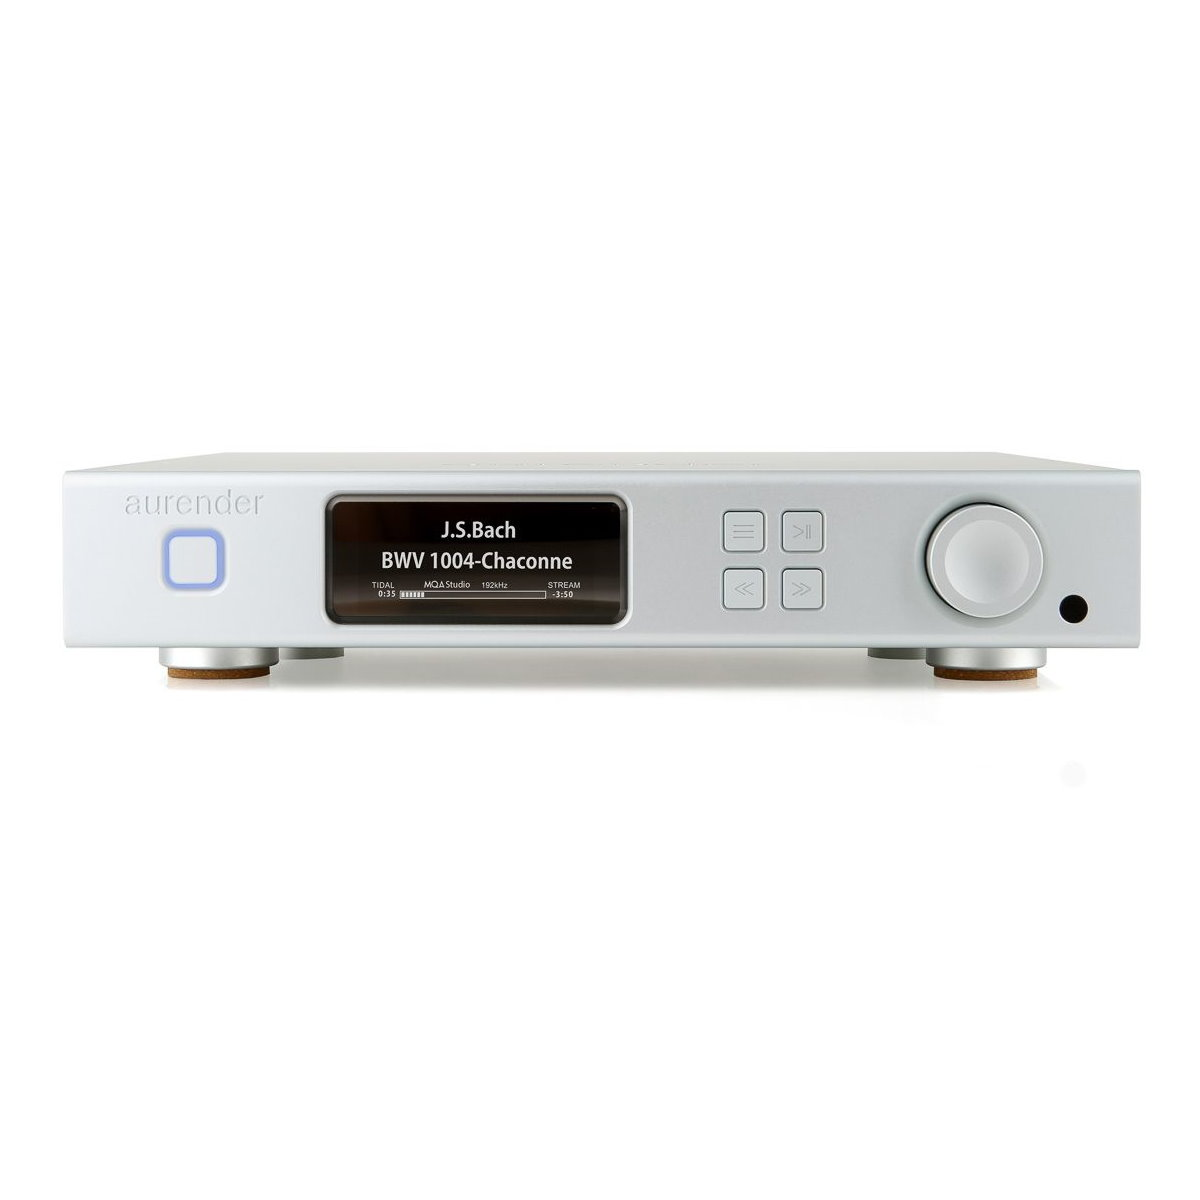 Aurender A100 Caching Music Server With Internal MQA Certified DAC